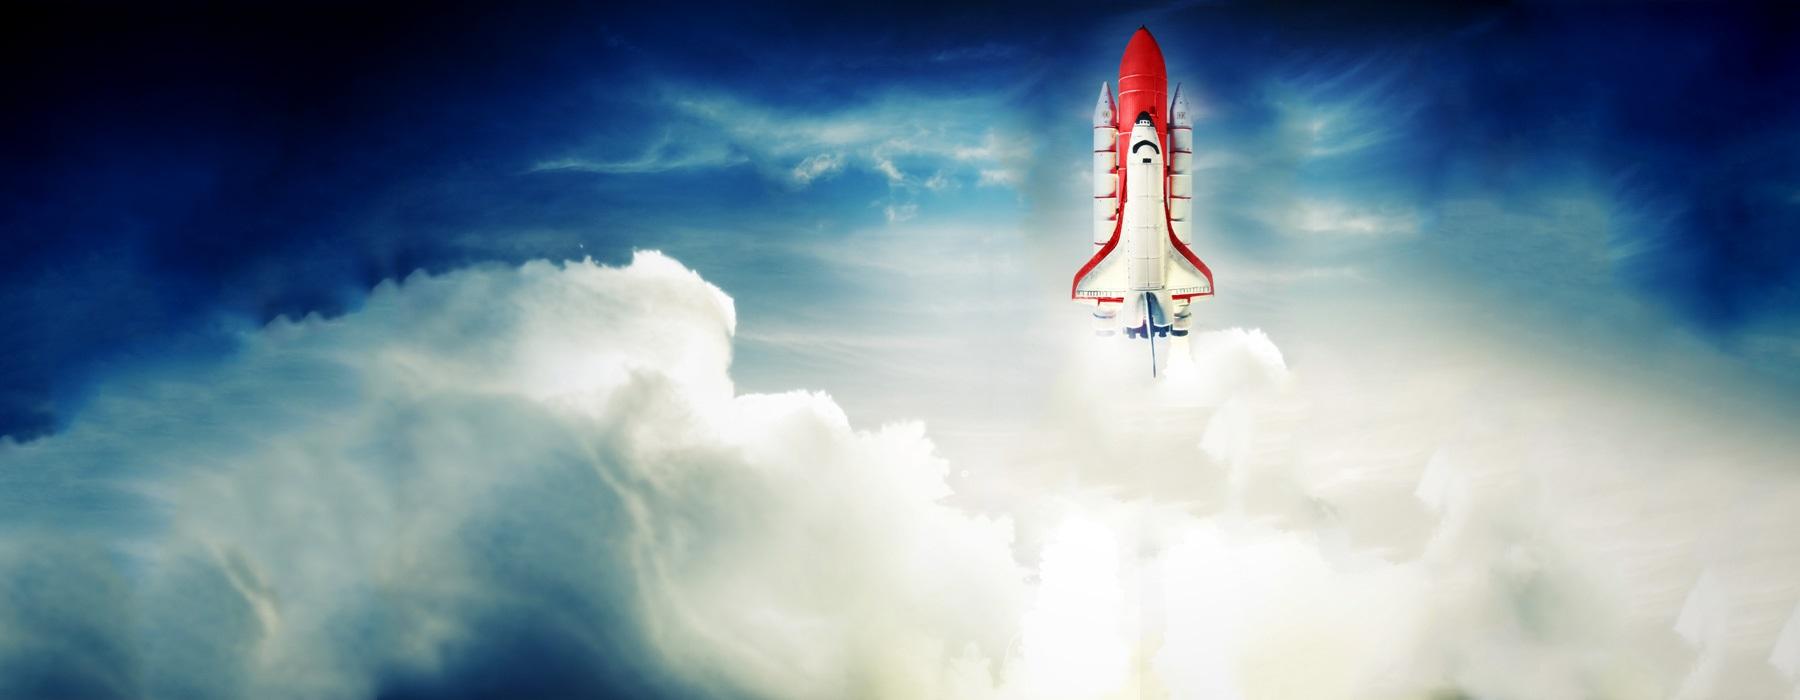 Sesam spaceshuttle